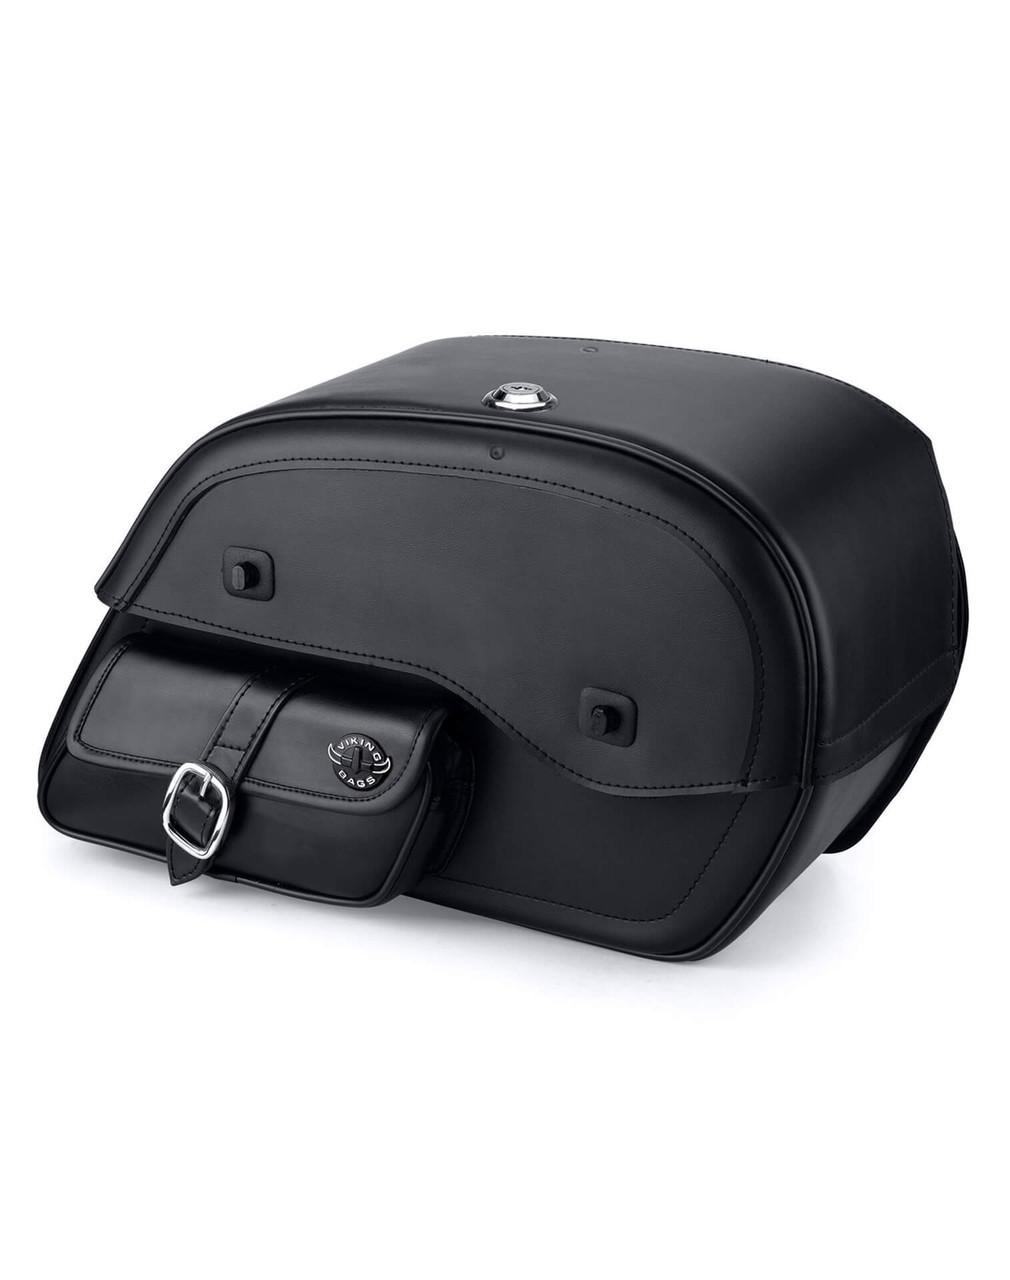 Viking Side Pocket Large Motorcycle Saddlebags For Harley Softail Cross Bones FLSTSB Main Bag View